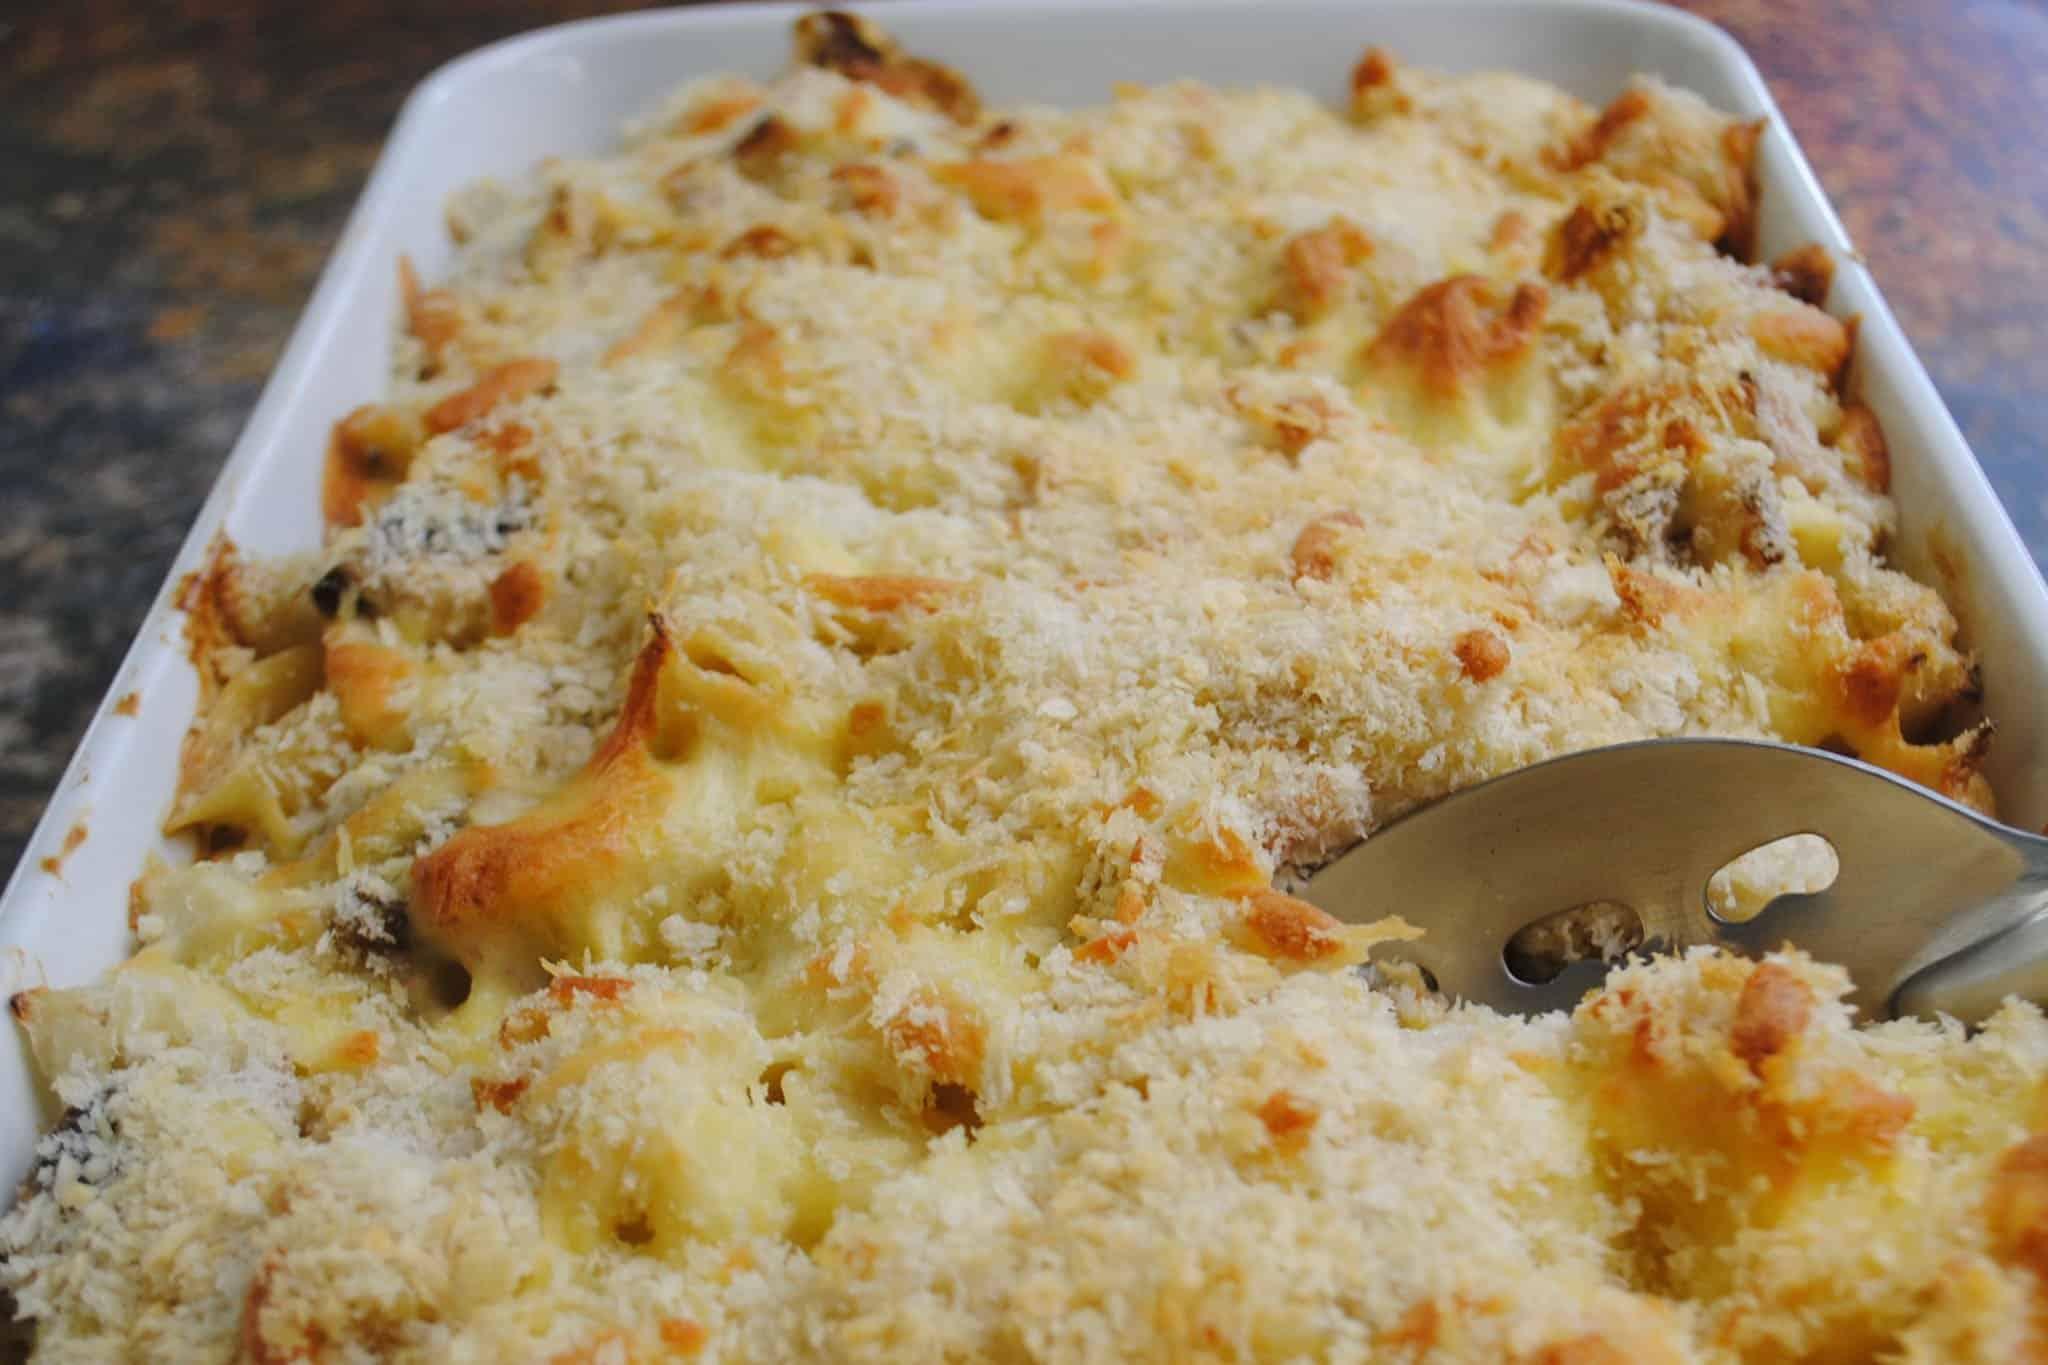 Cauliflower pasta bake with bacon and mushrooms